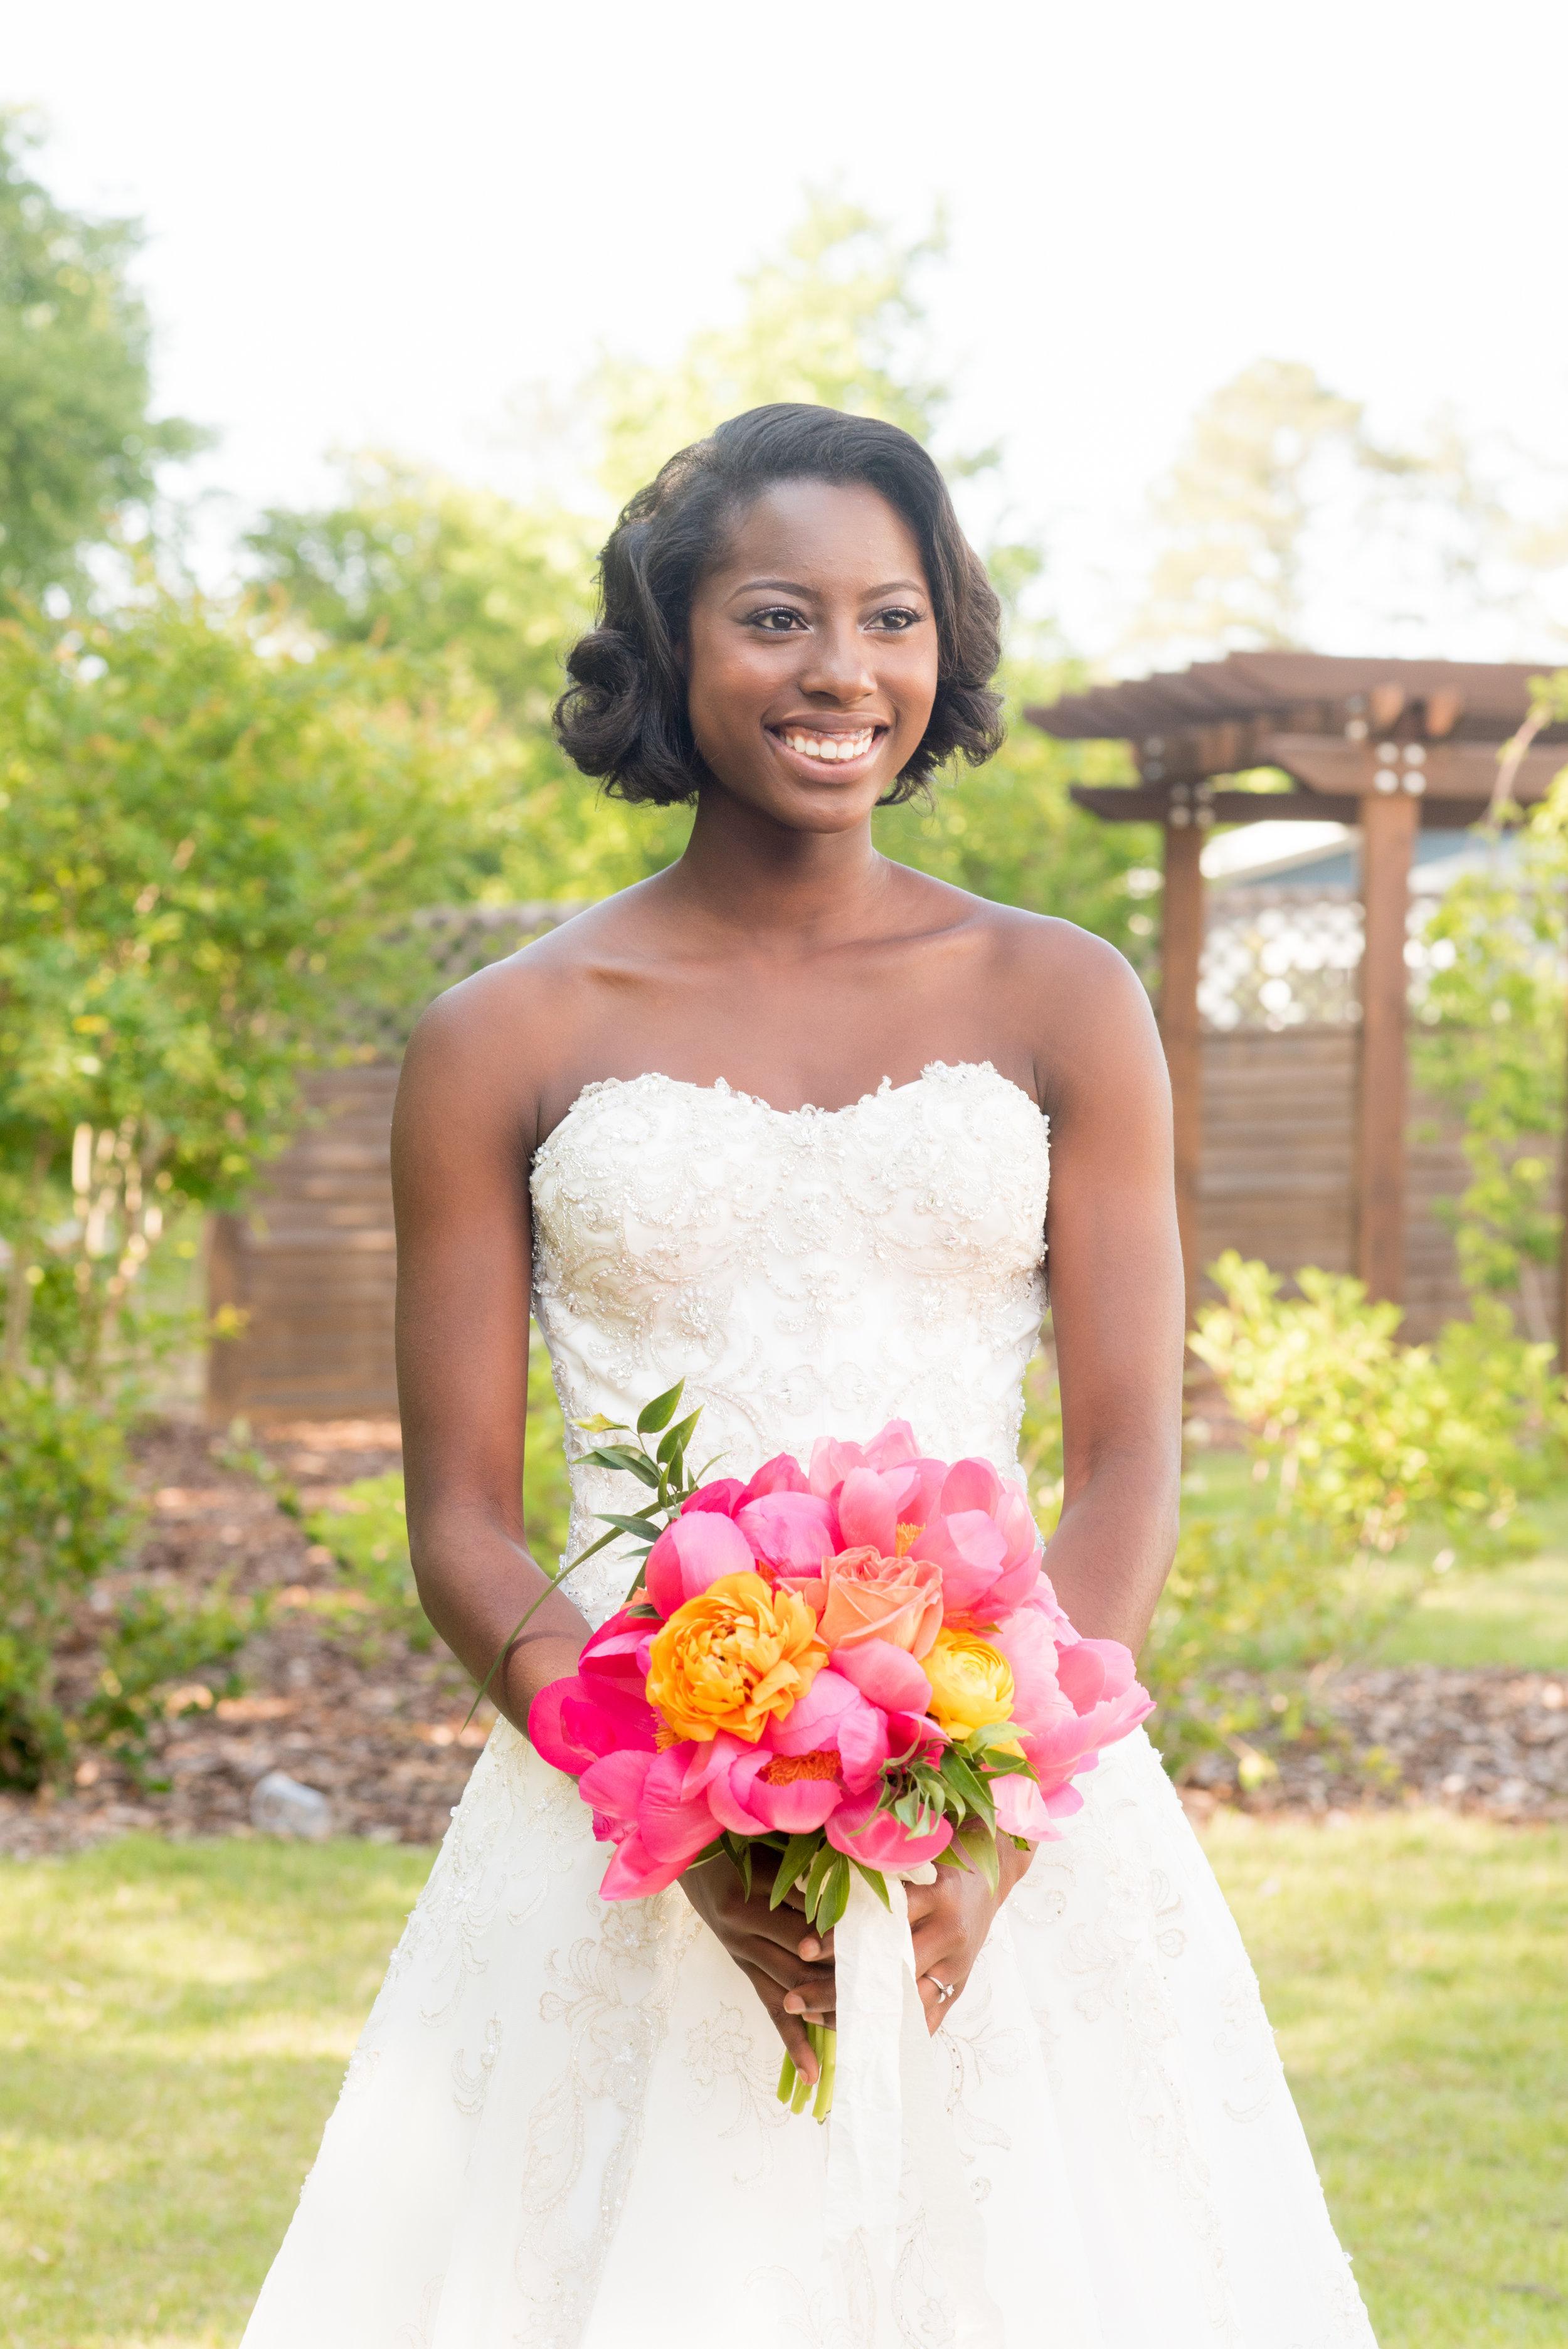 mikkelpaige-the_bradford_raleigh-wedding-coral_styled_shoot-095.jpg